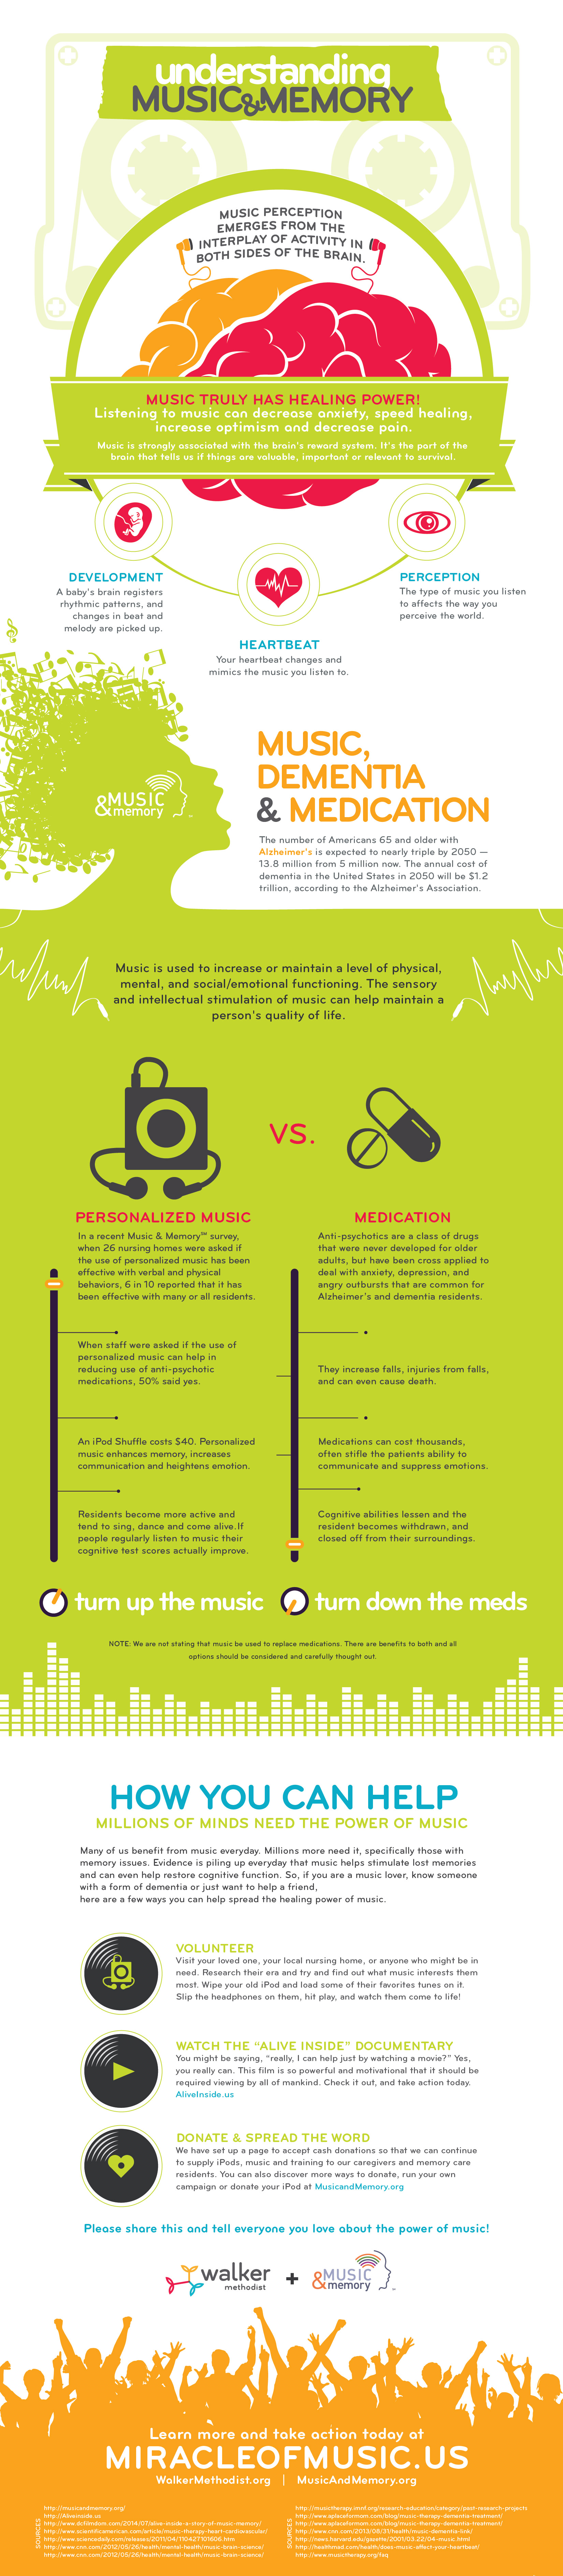 Understanding Music & Memory - An Infographic